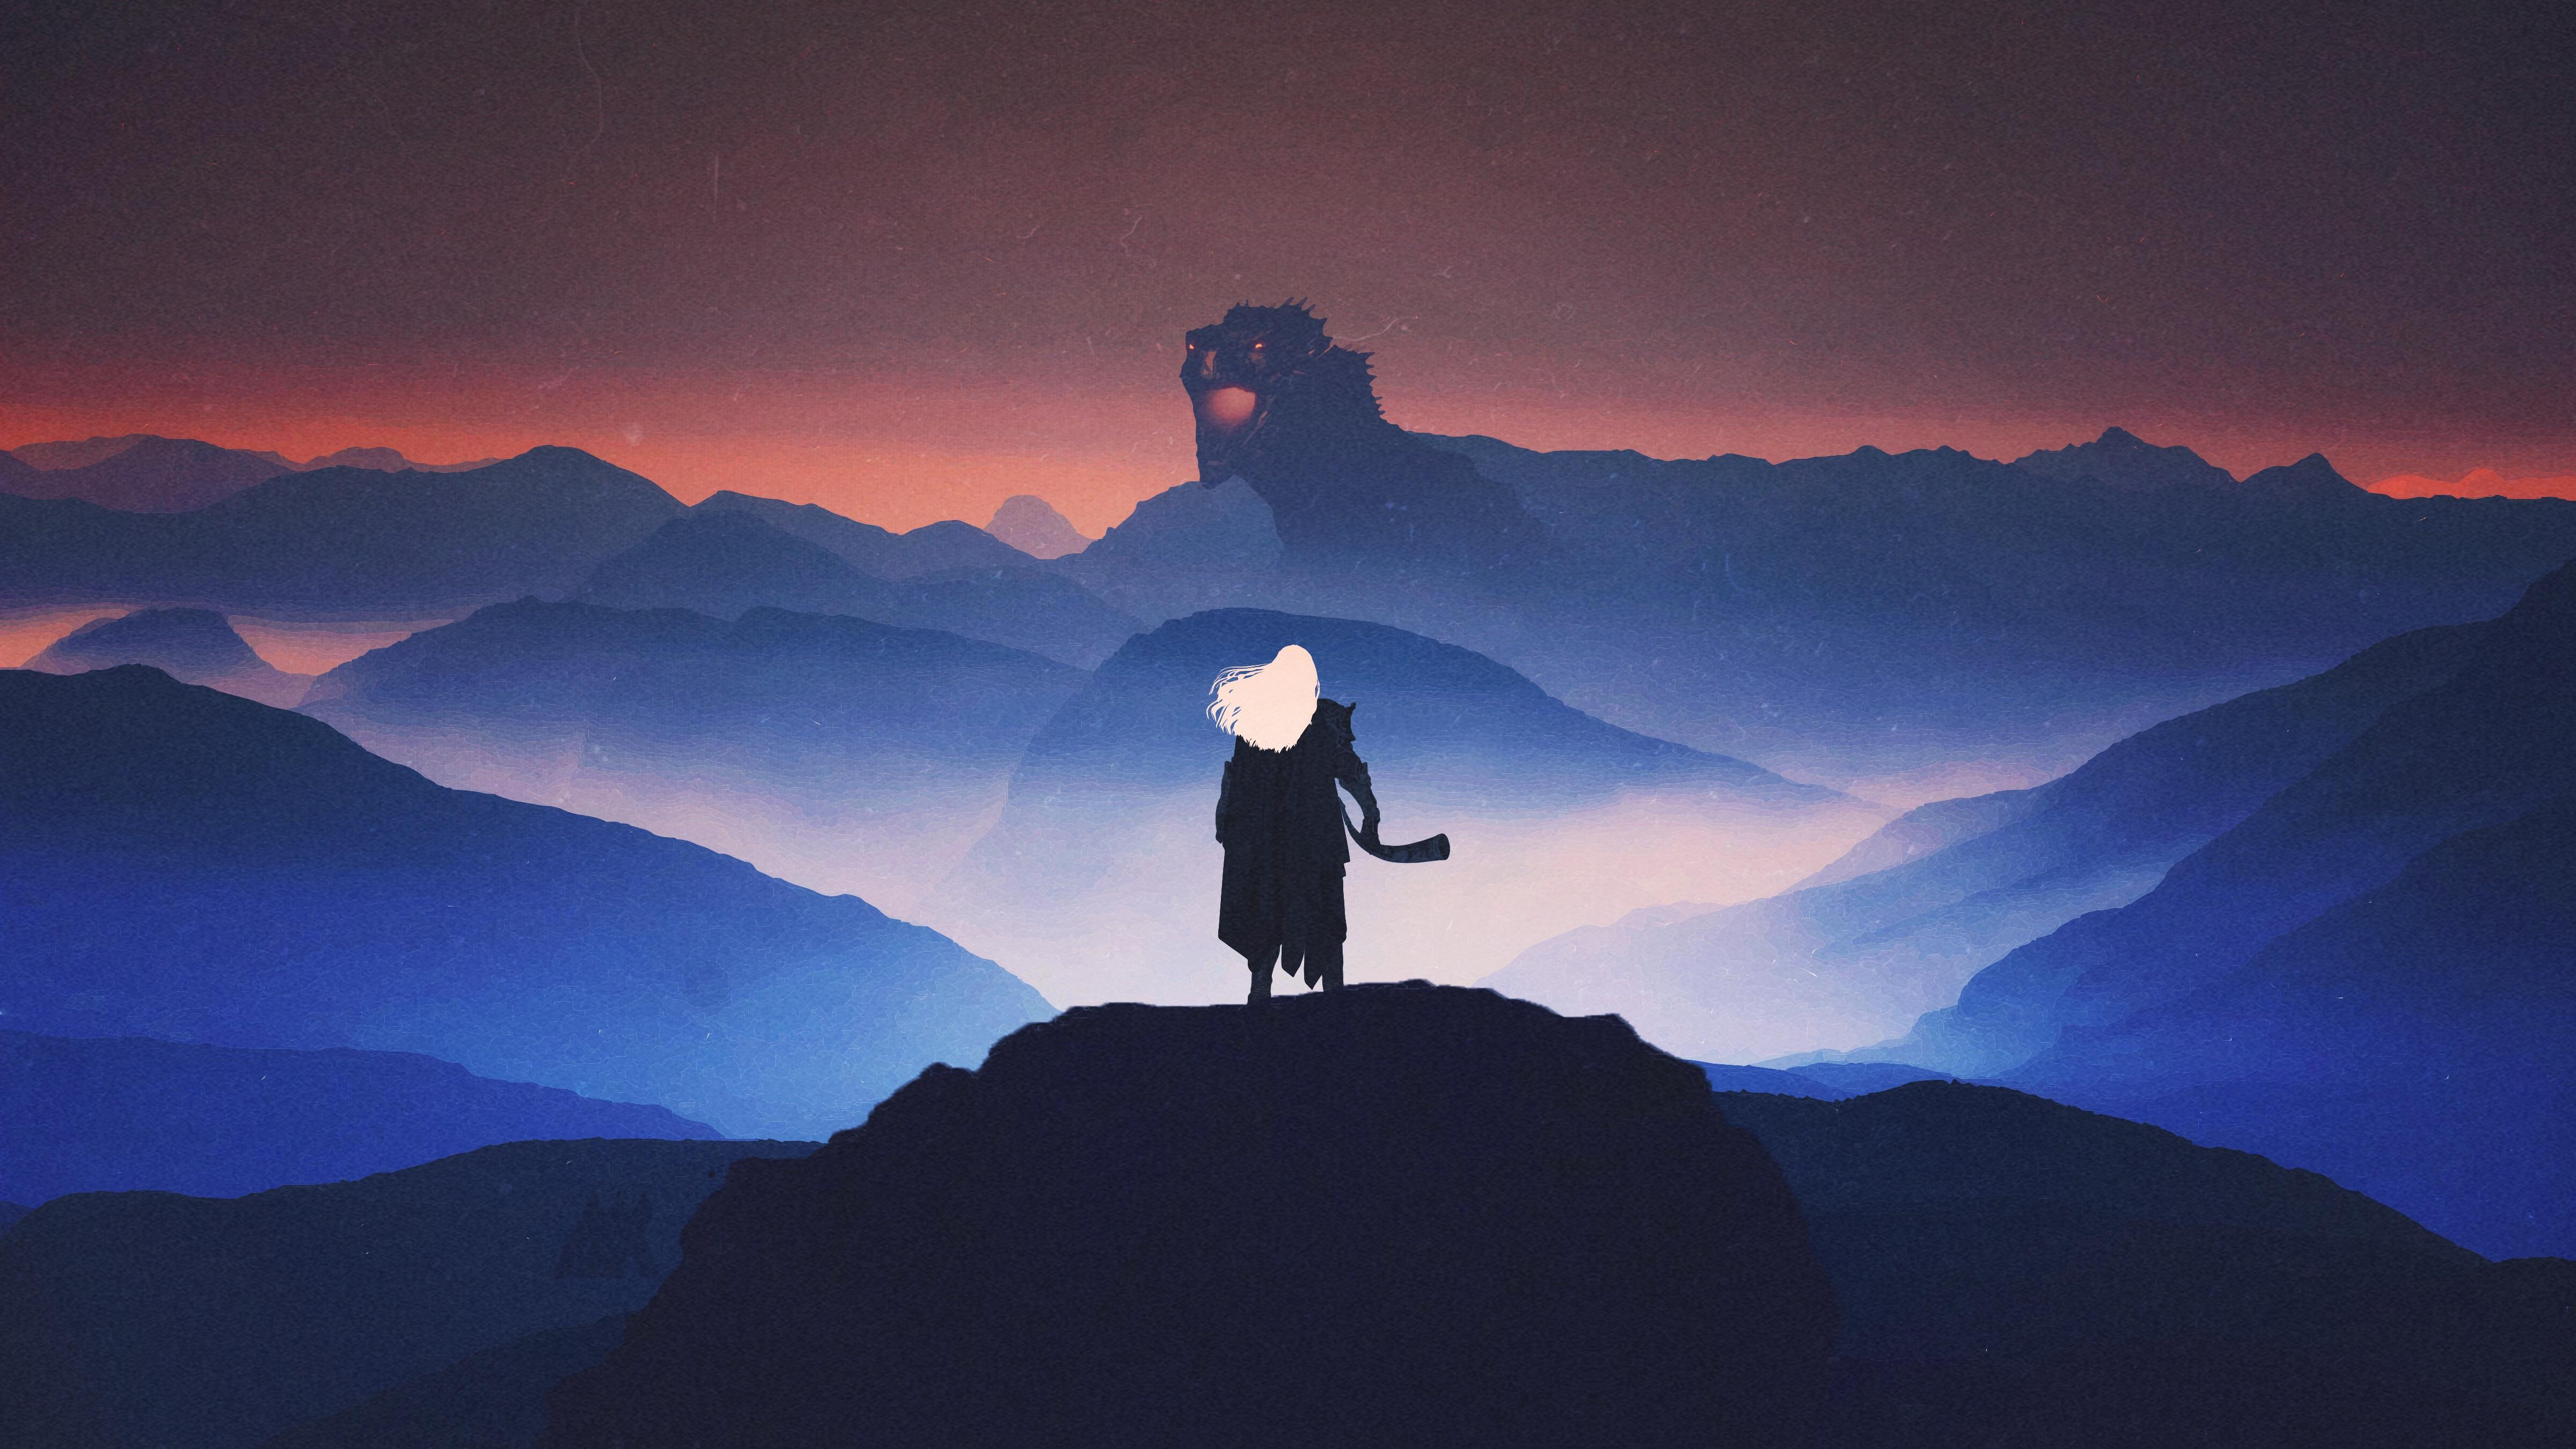 2332 Aegon the Conqueror desktop images 2019 4800x2700